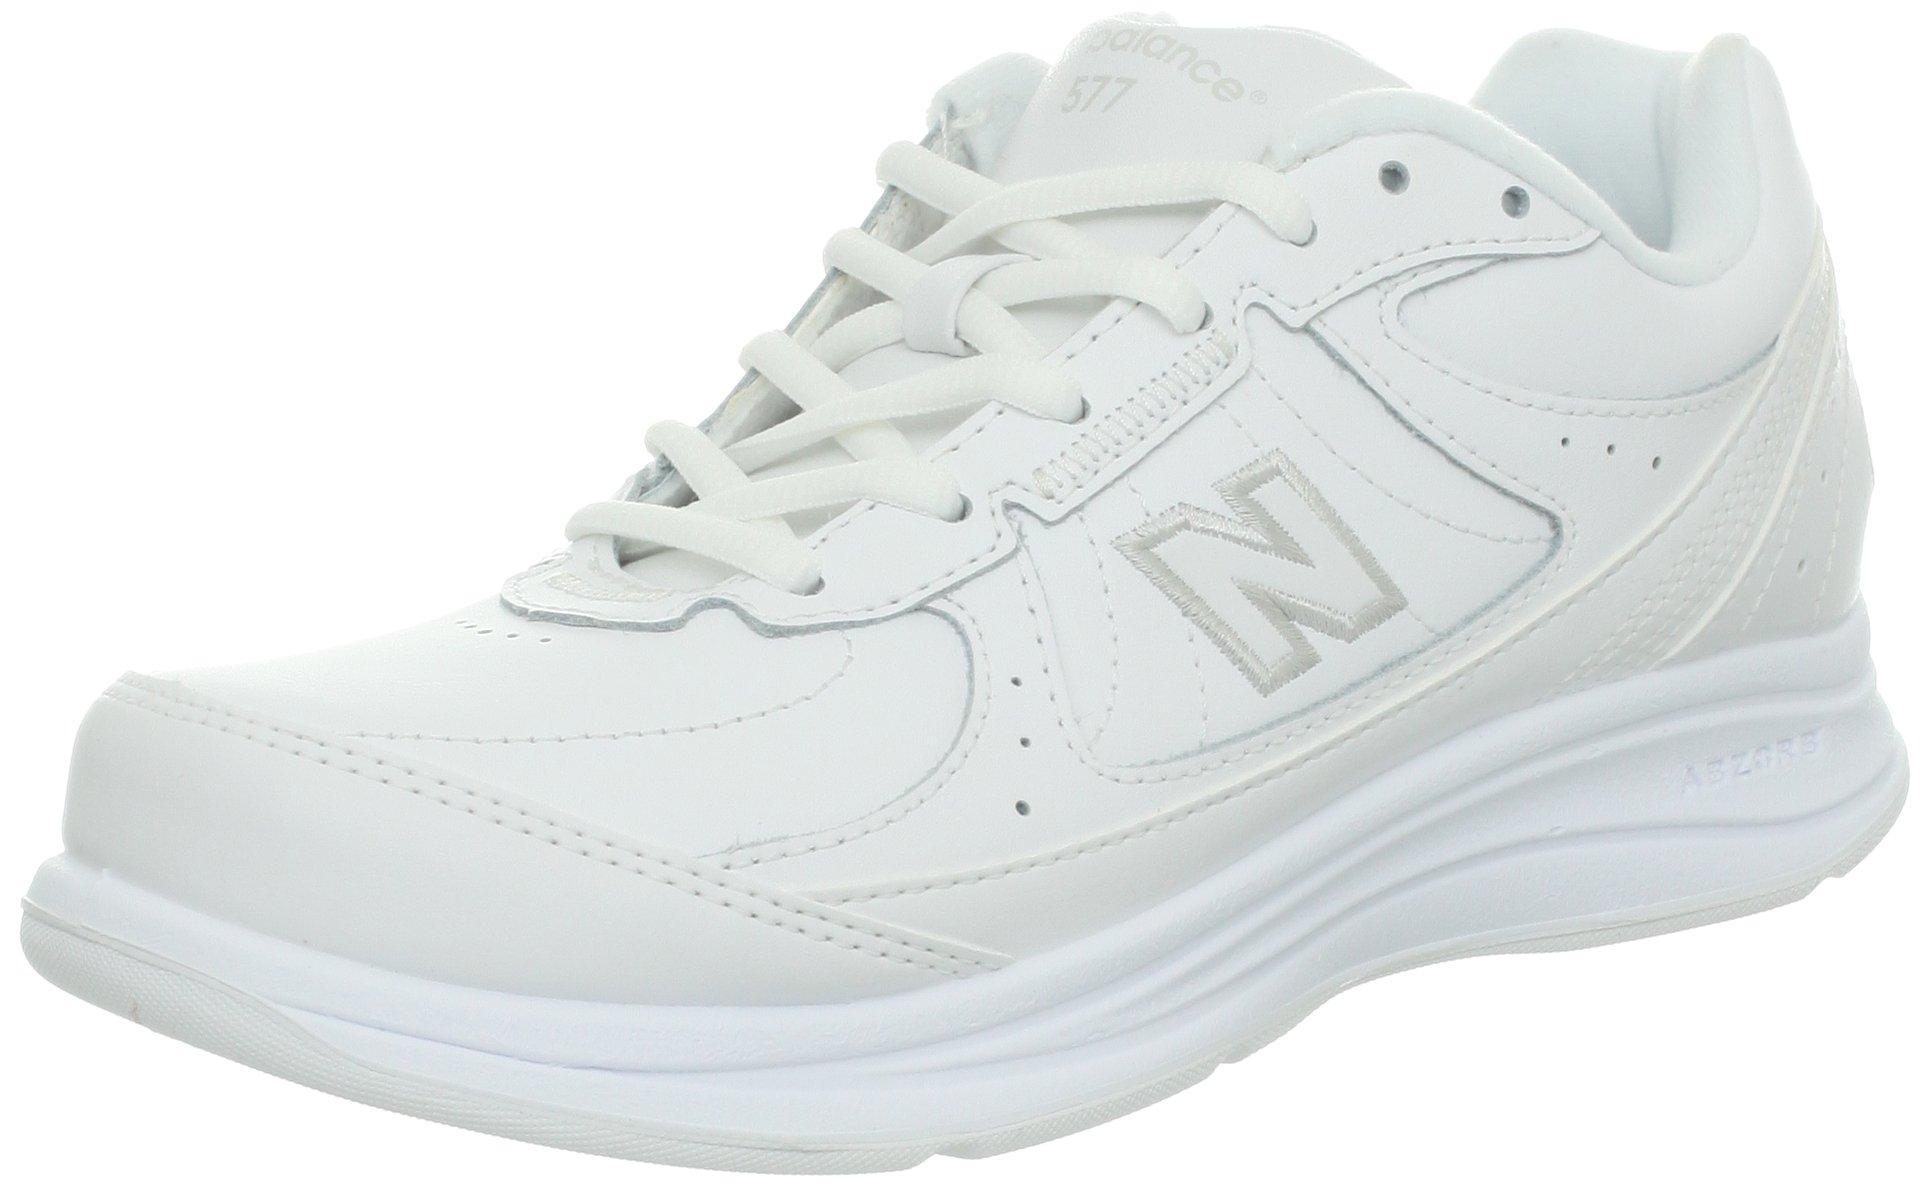 New Balance Women's WW577 Walking Shoe, White, 8 D US by New Balance